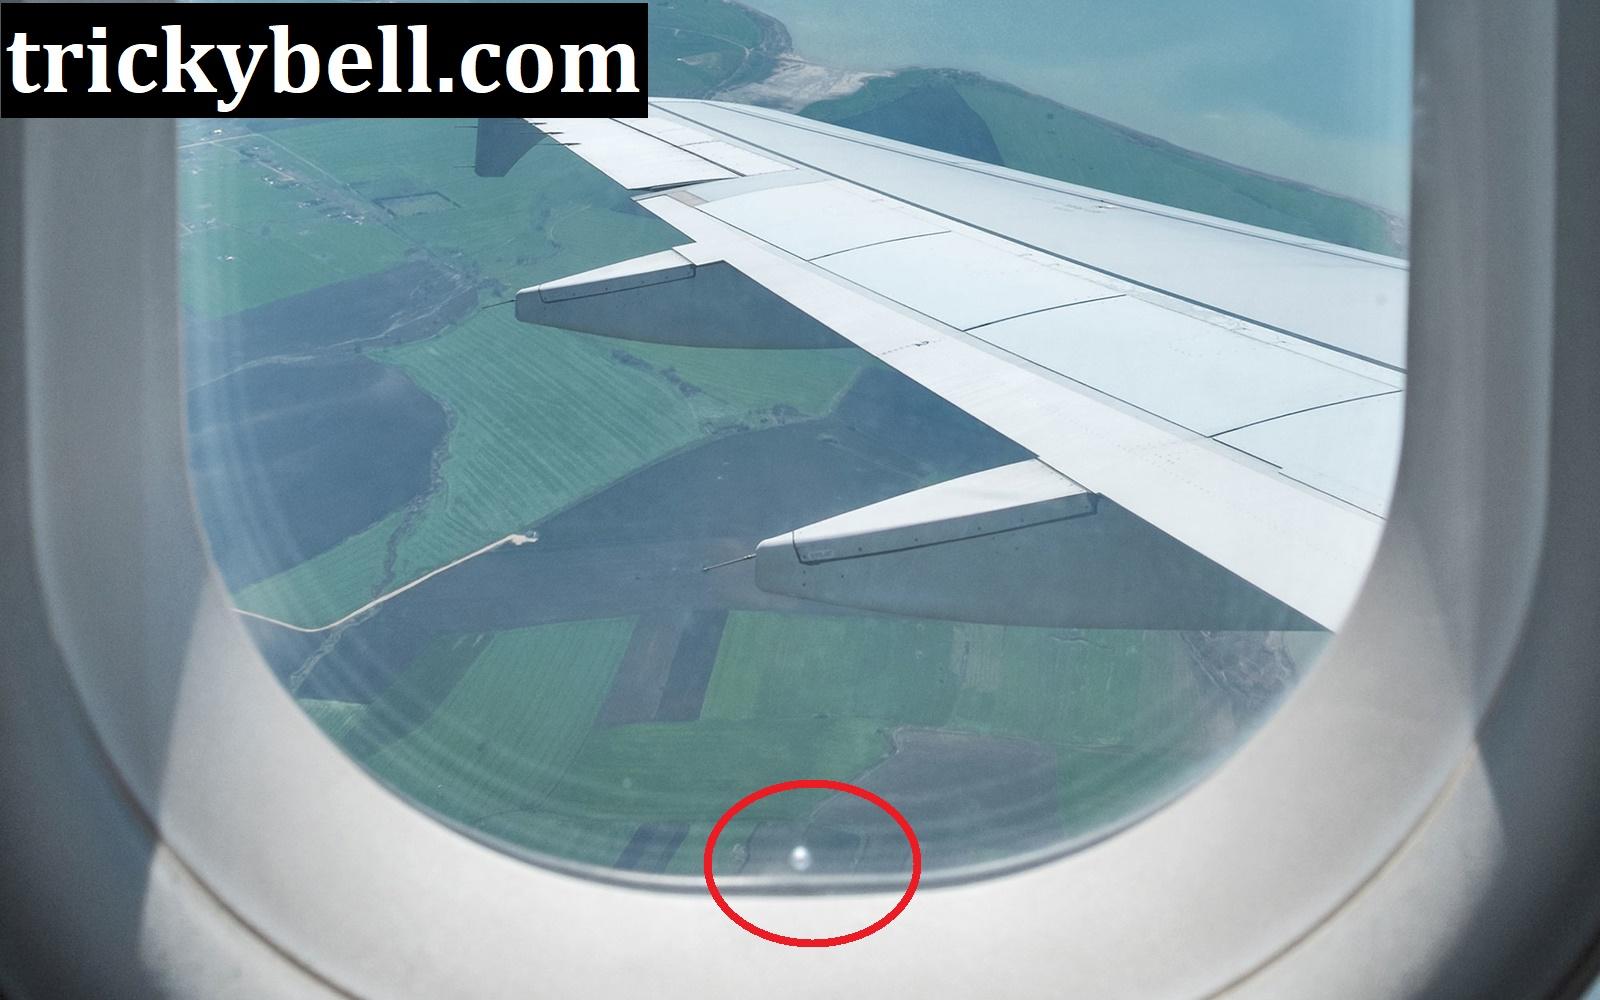 Why Aeroplane Windows Have A Tiny Hole at the Bottom?